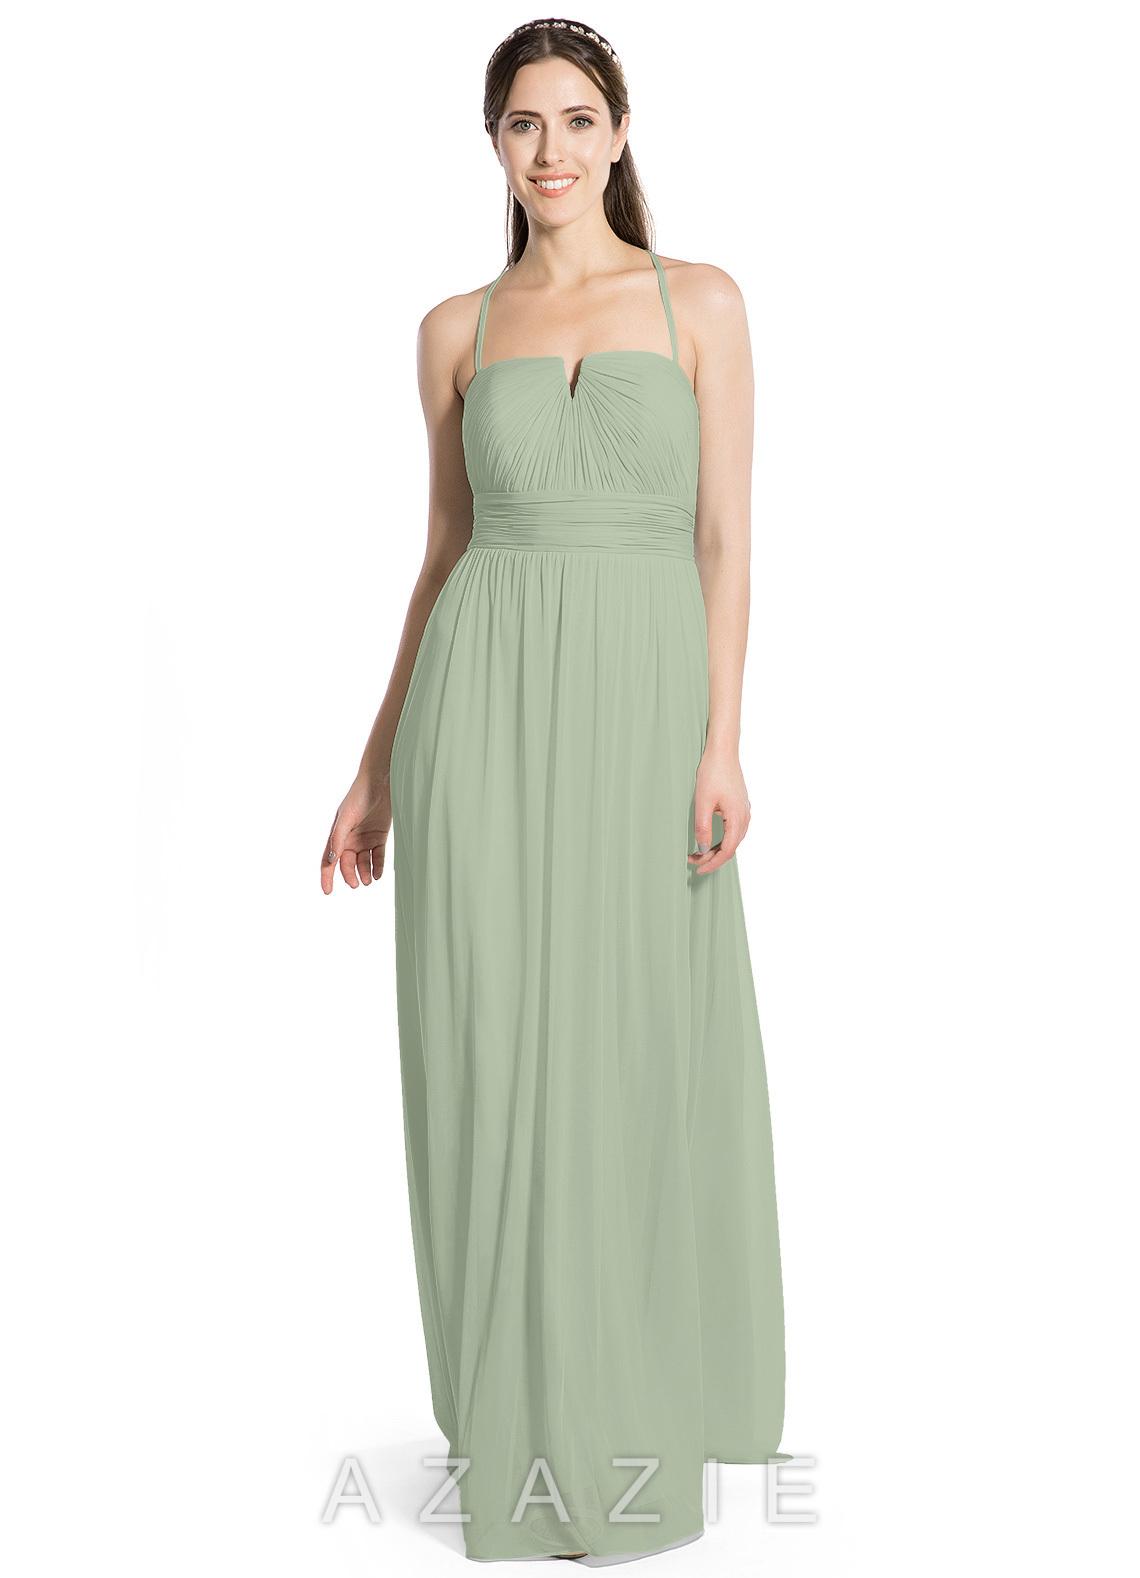 ef5d1462afd Azazie Devin Bridesmaid Dress